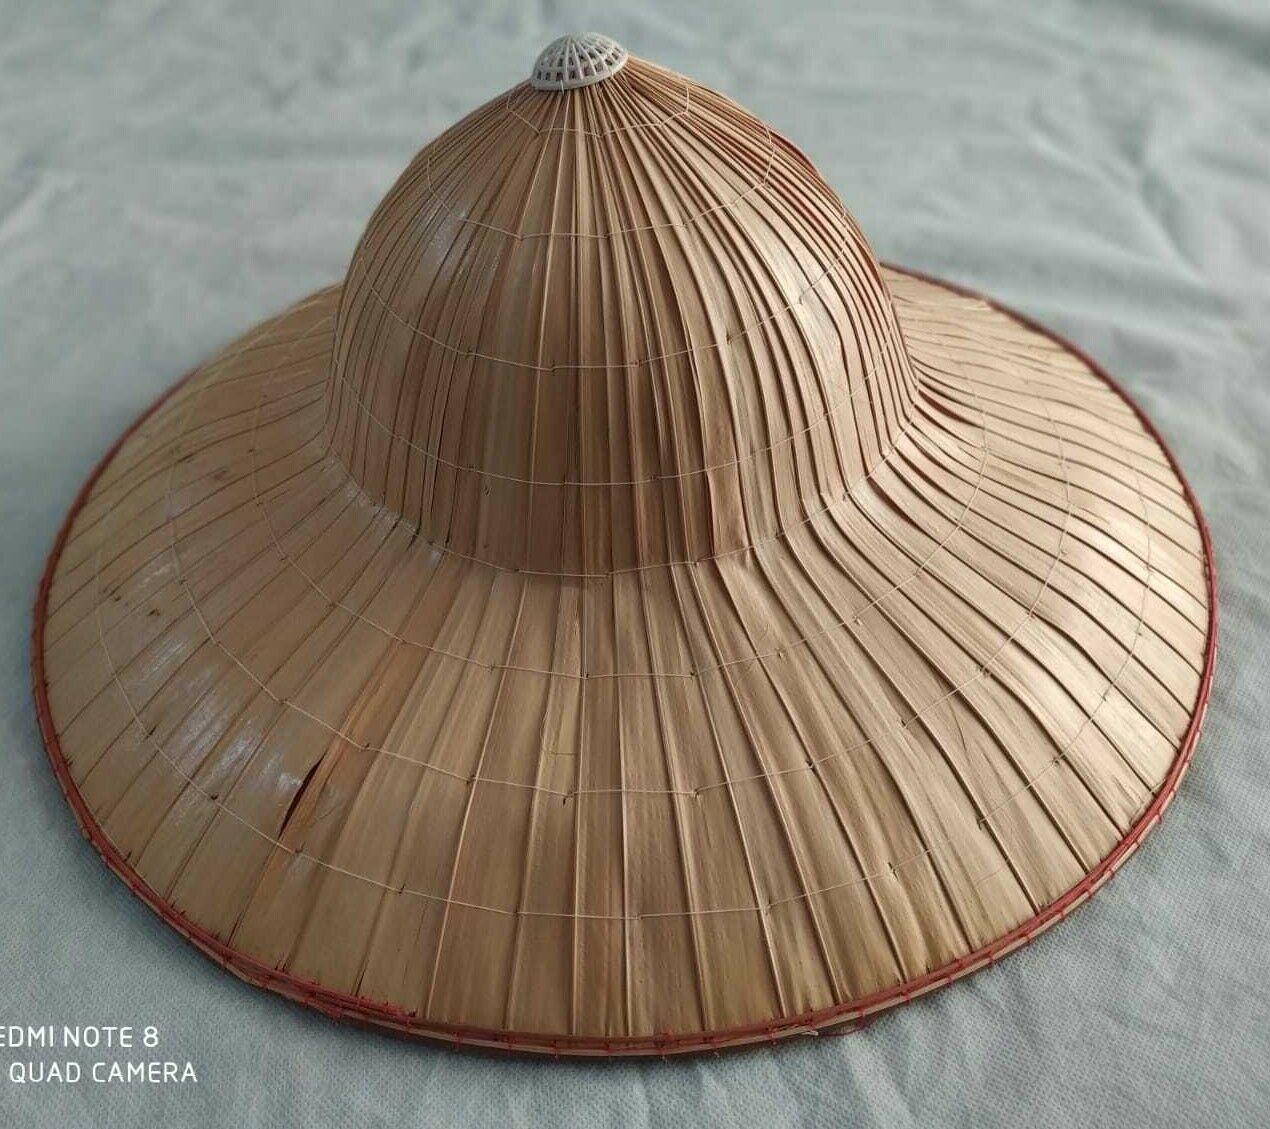 42cm 17 Vietnamese Japanese Asian Coolie Straw Bamboo Sun Hat Farmer Costume For Sale Online Ebay